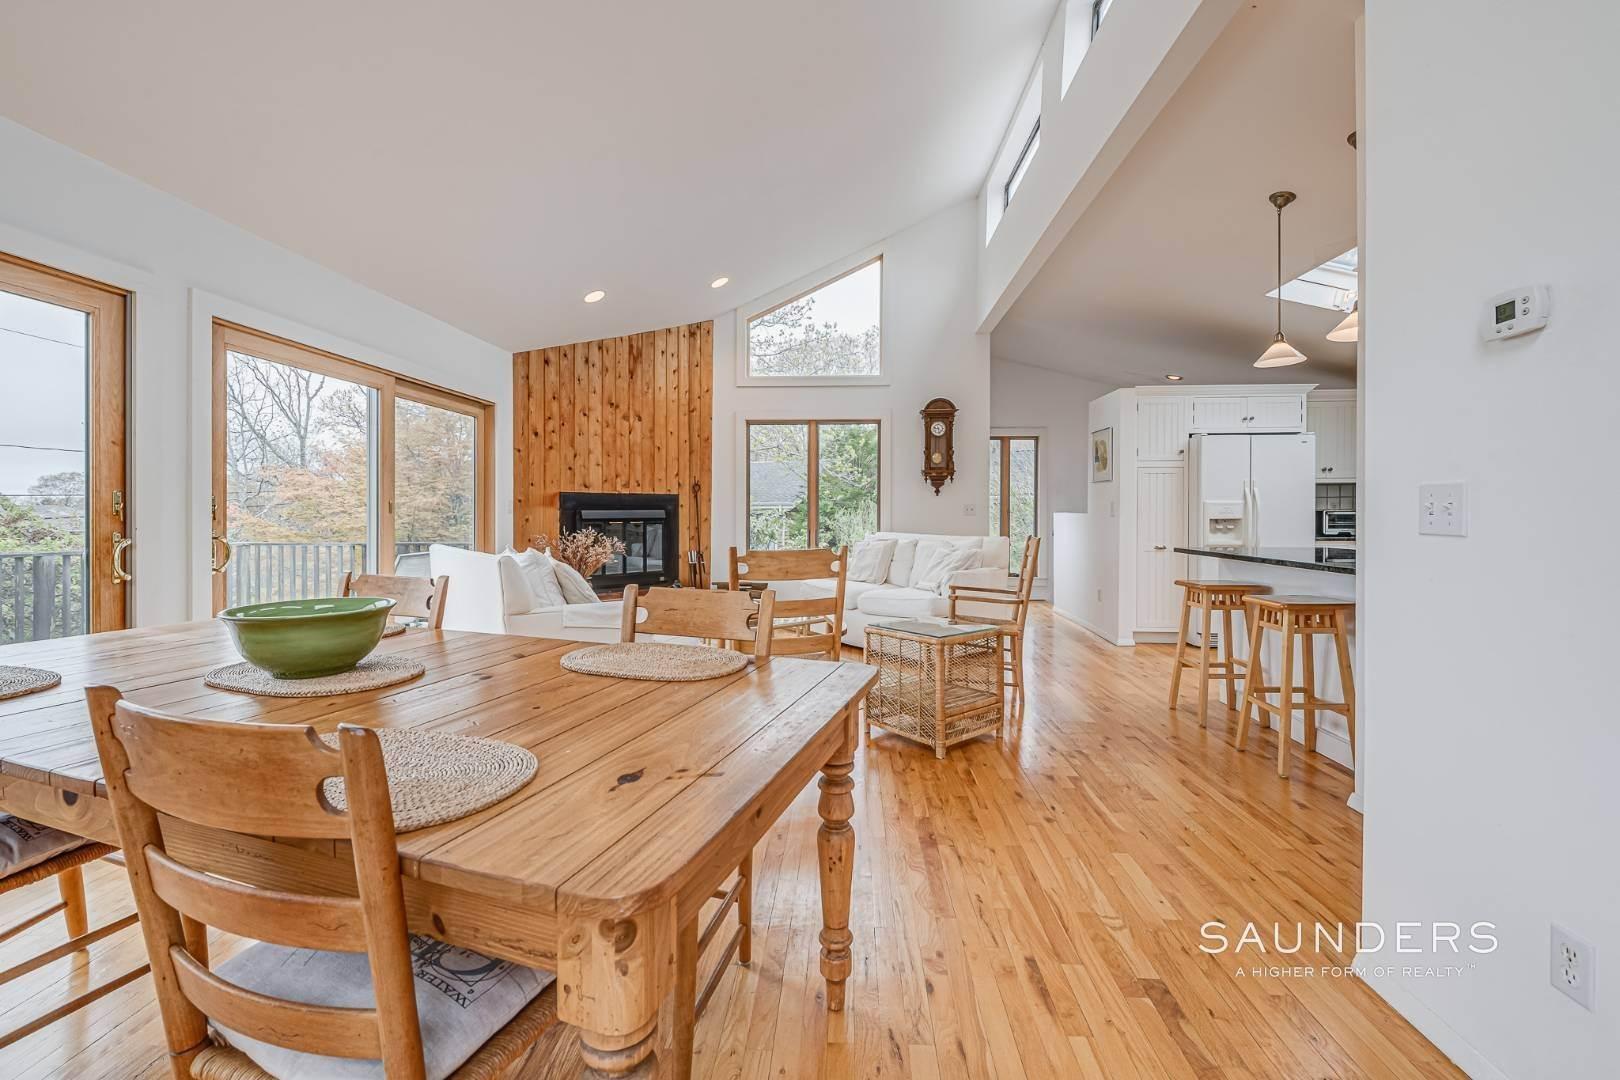 3. Single Family Homes for Sale at Montauk Beach House 8 Stuyvesant Drive, Montauk, East Hampton Town, NY 11954